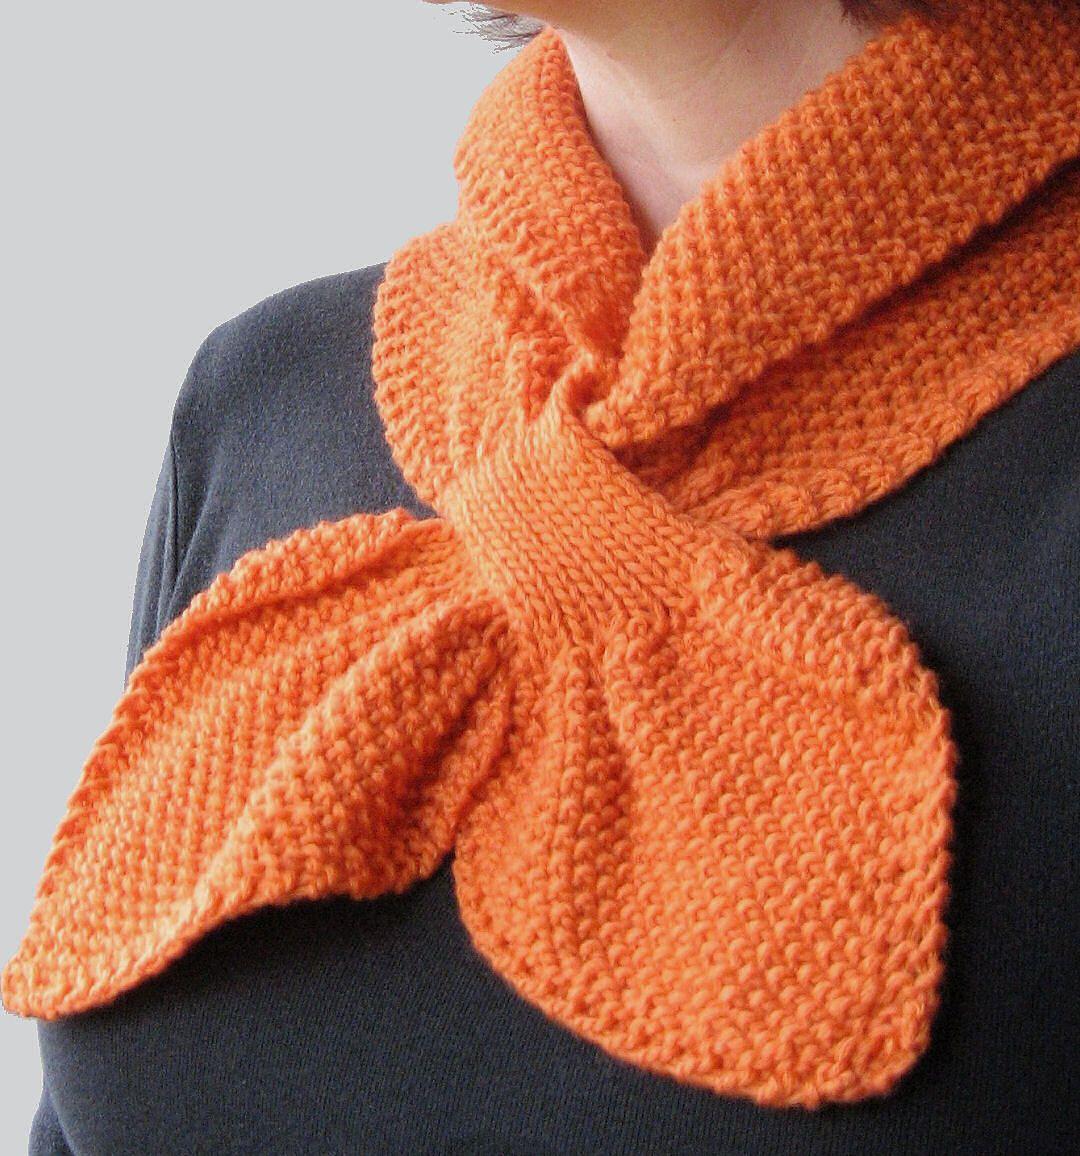 Moss Stitch Keyhole Scarflette pattern by Jo-Anne Klim